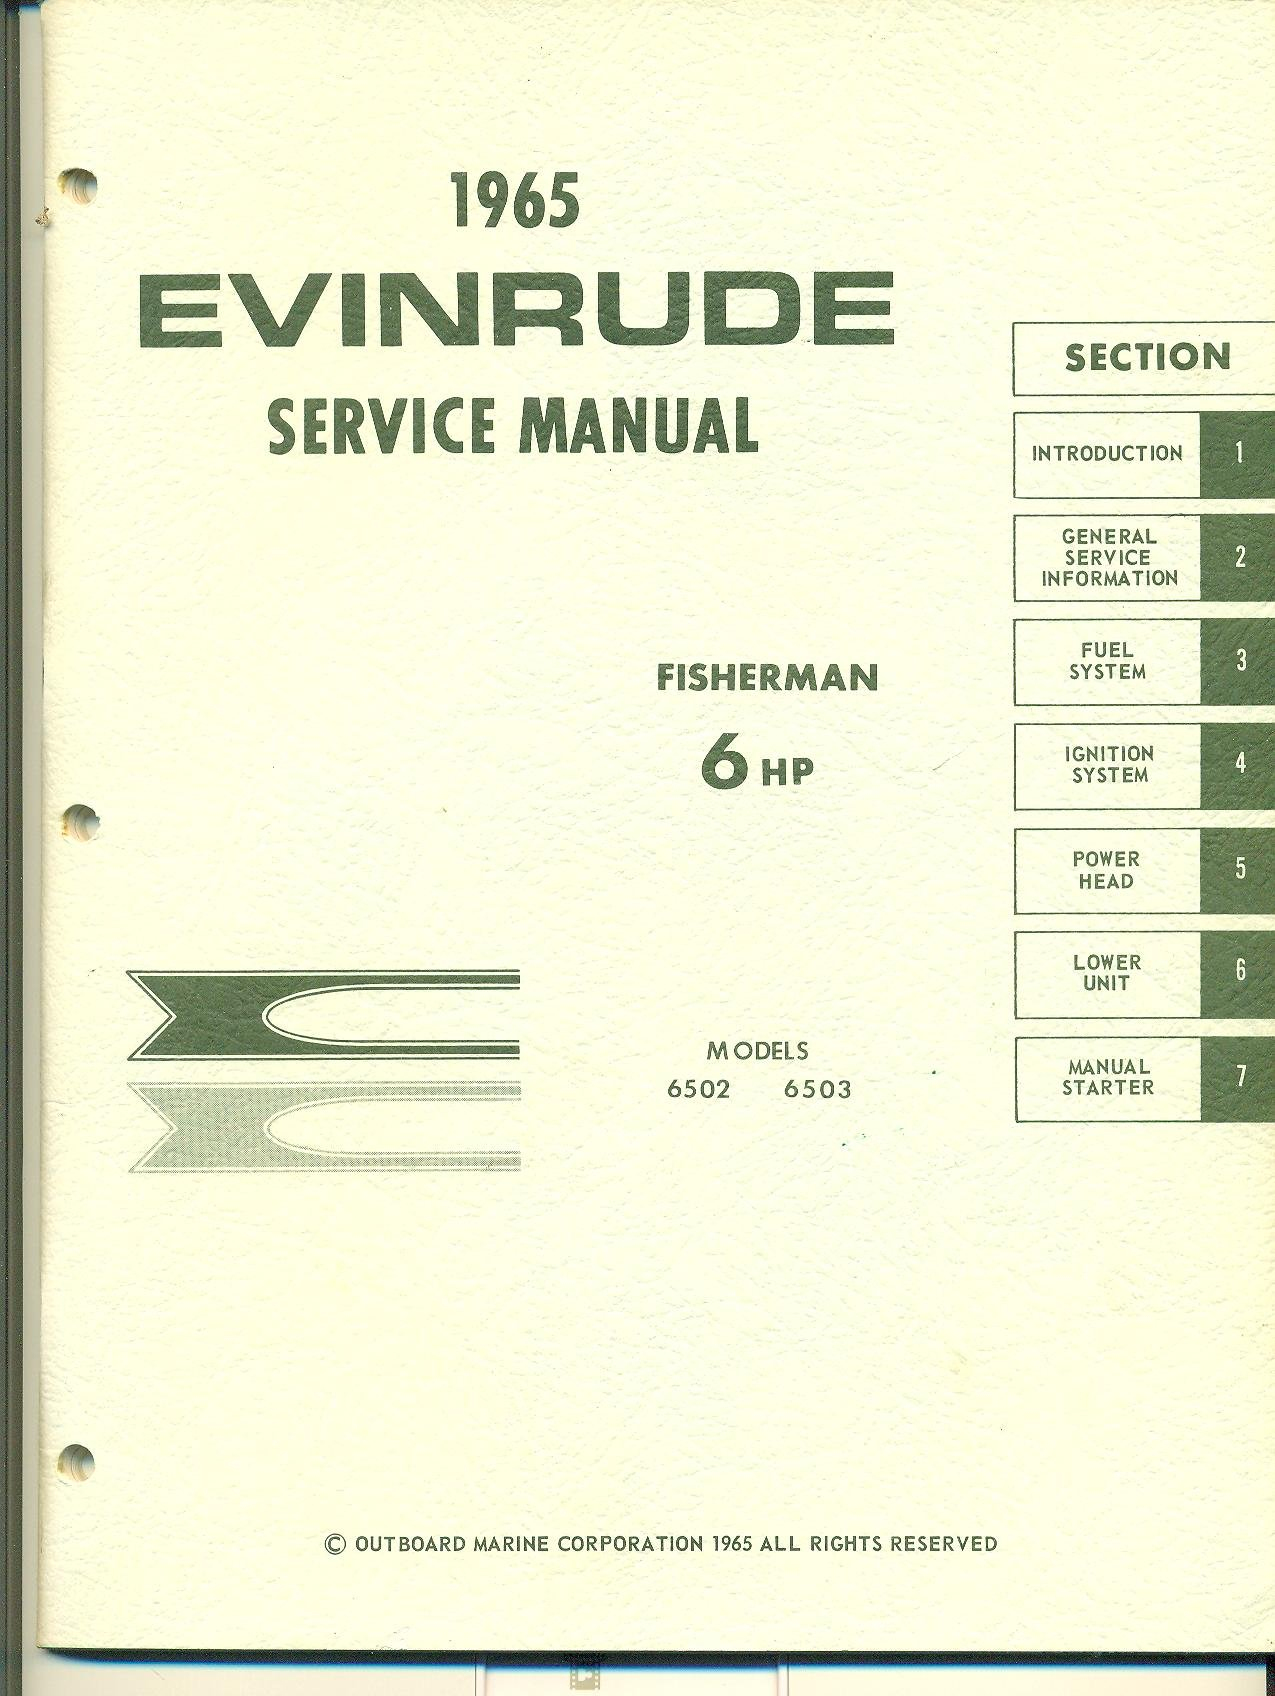 Evinrude 6 hp manual pdf